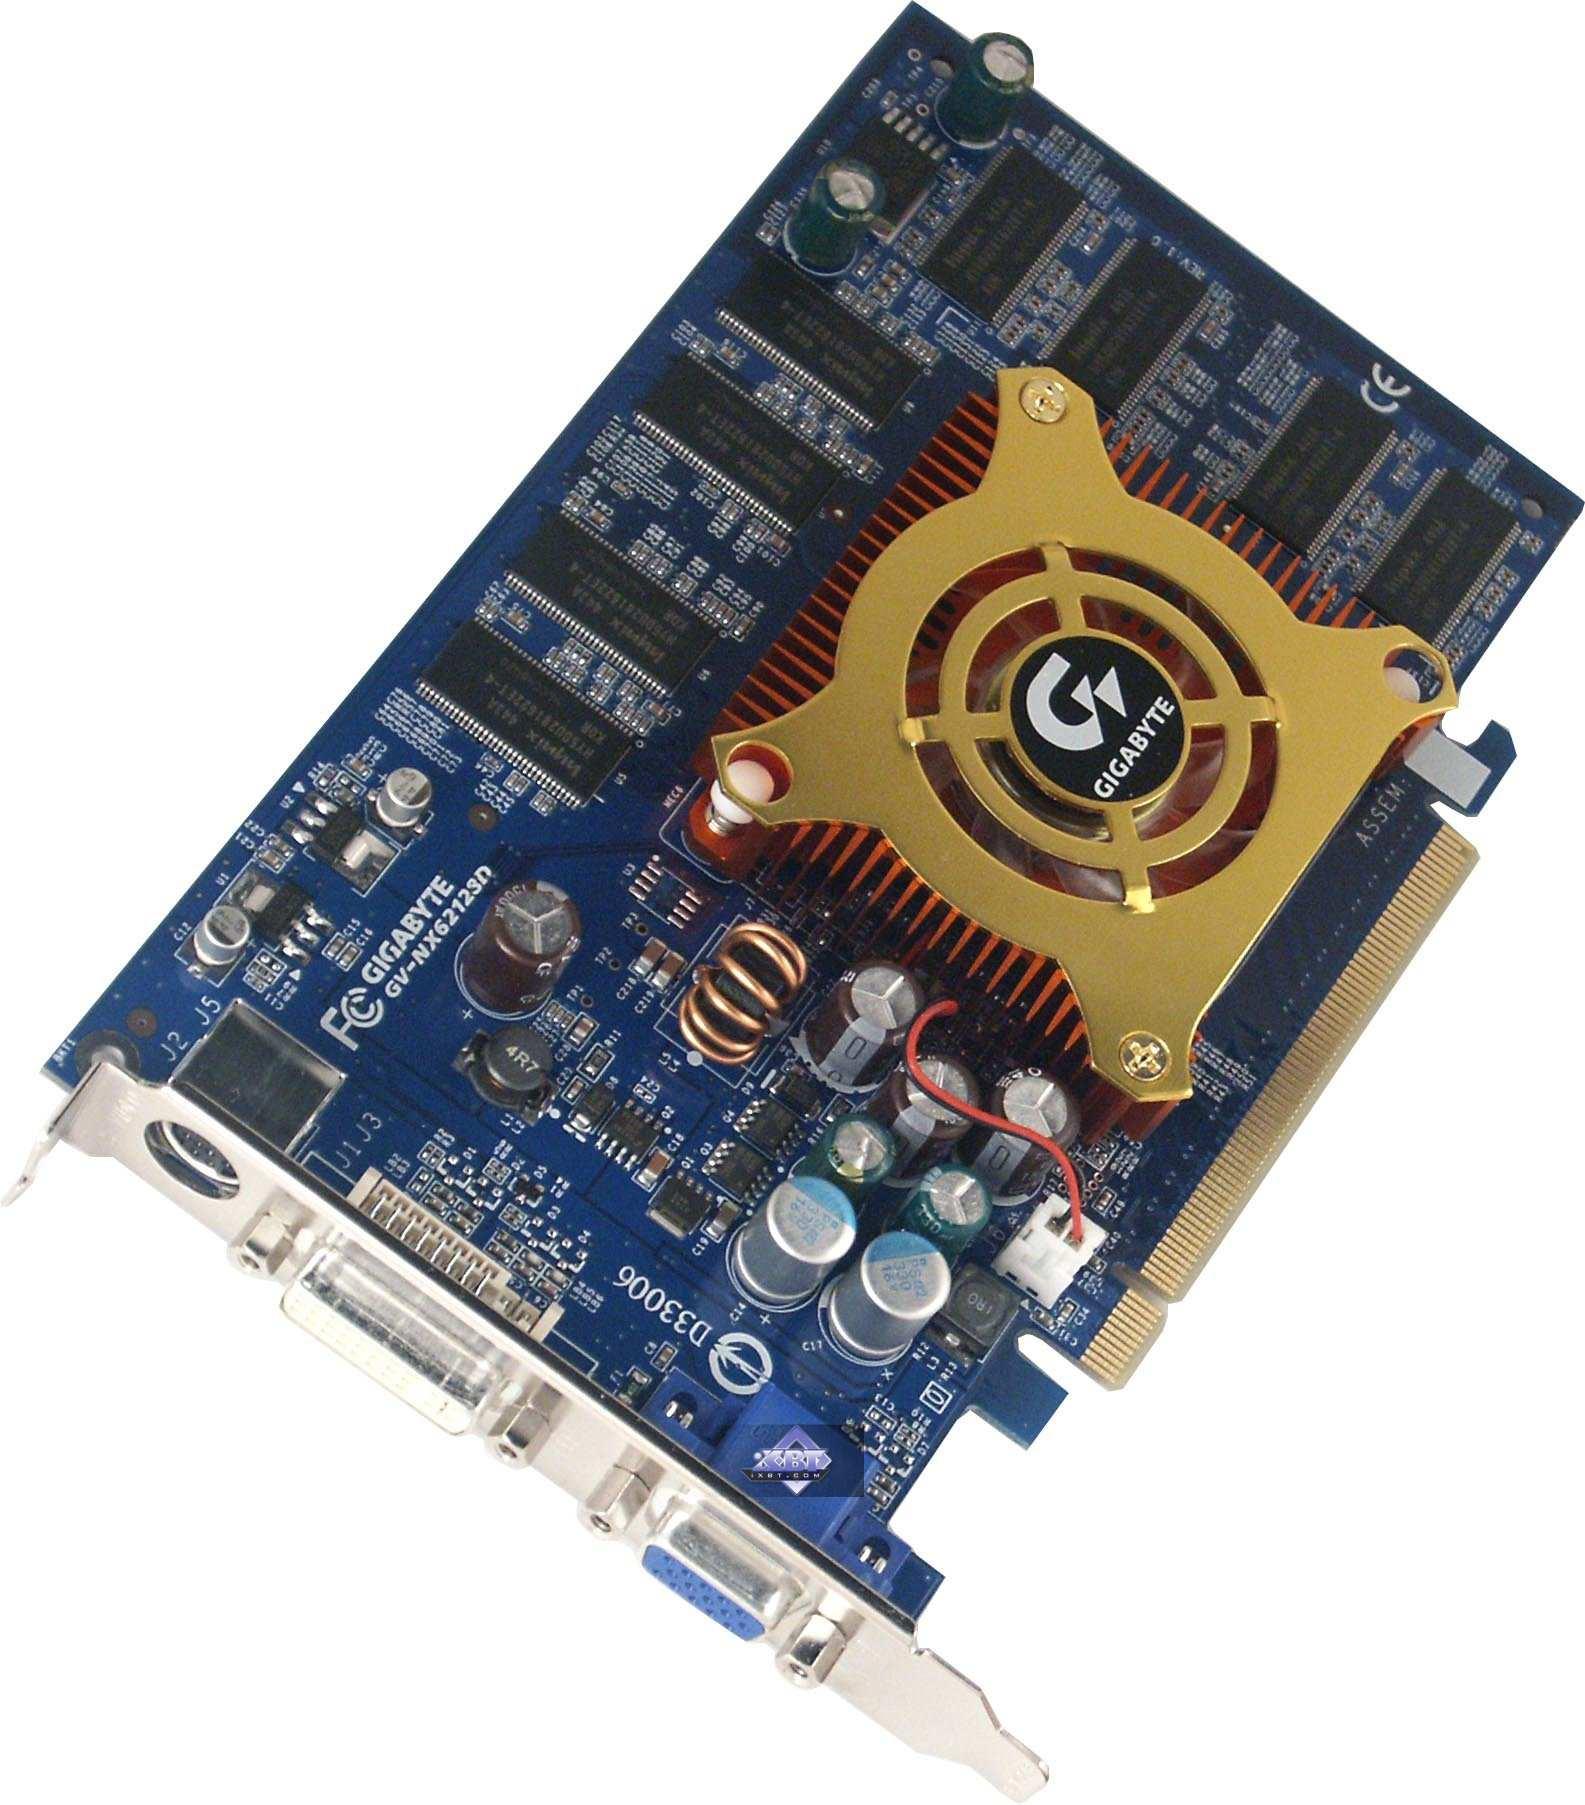 NVIDIA GeForce 6200/6600/6600GT based Video Cards: ASUS